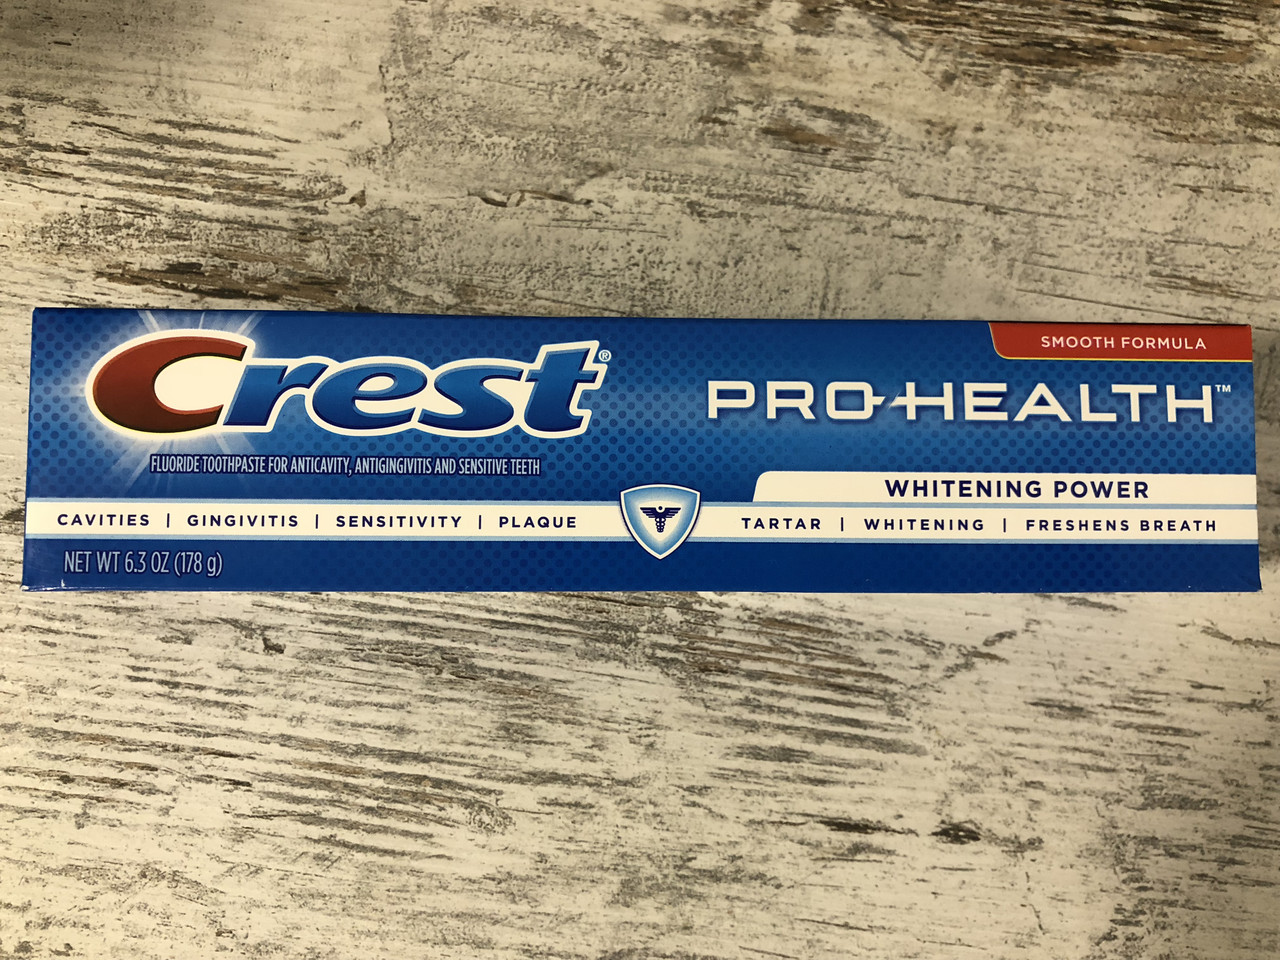 Отбеливающая зубная паста Crest Pro-Health Whitening Power, 178грамм